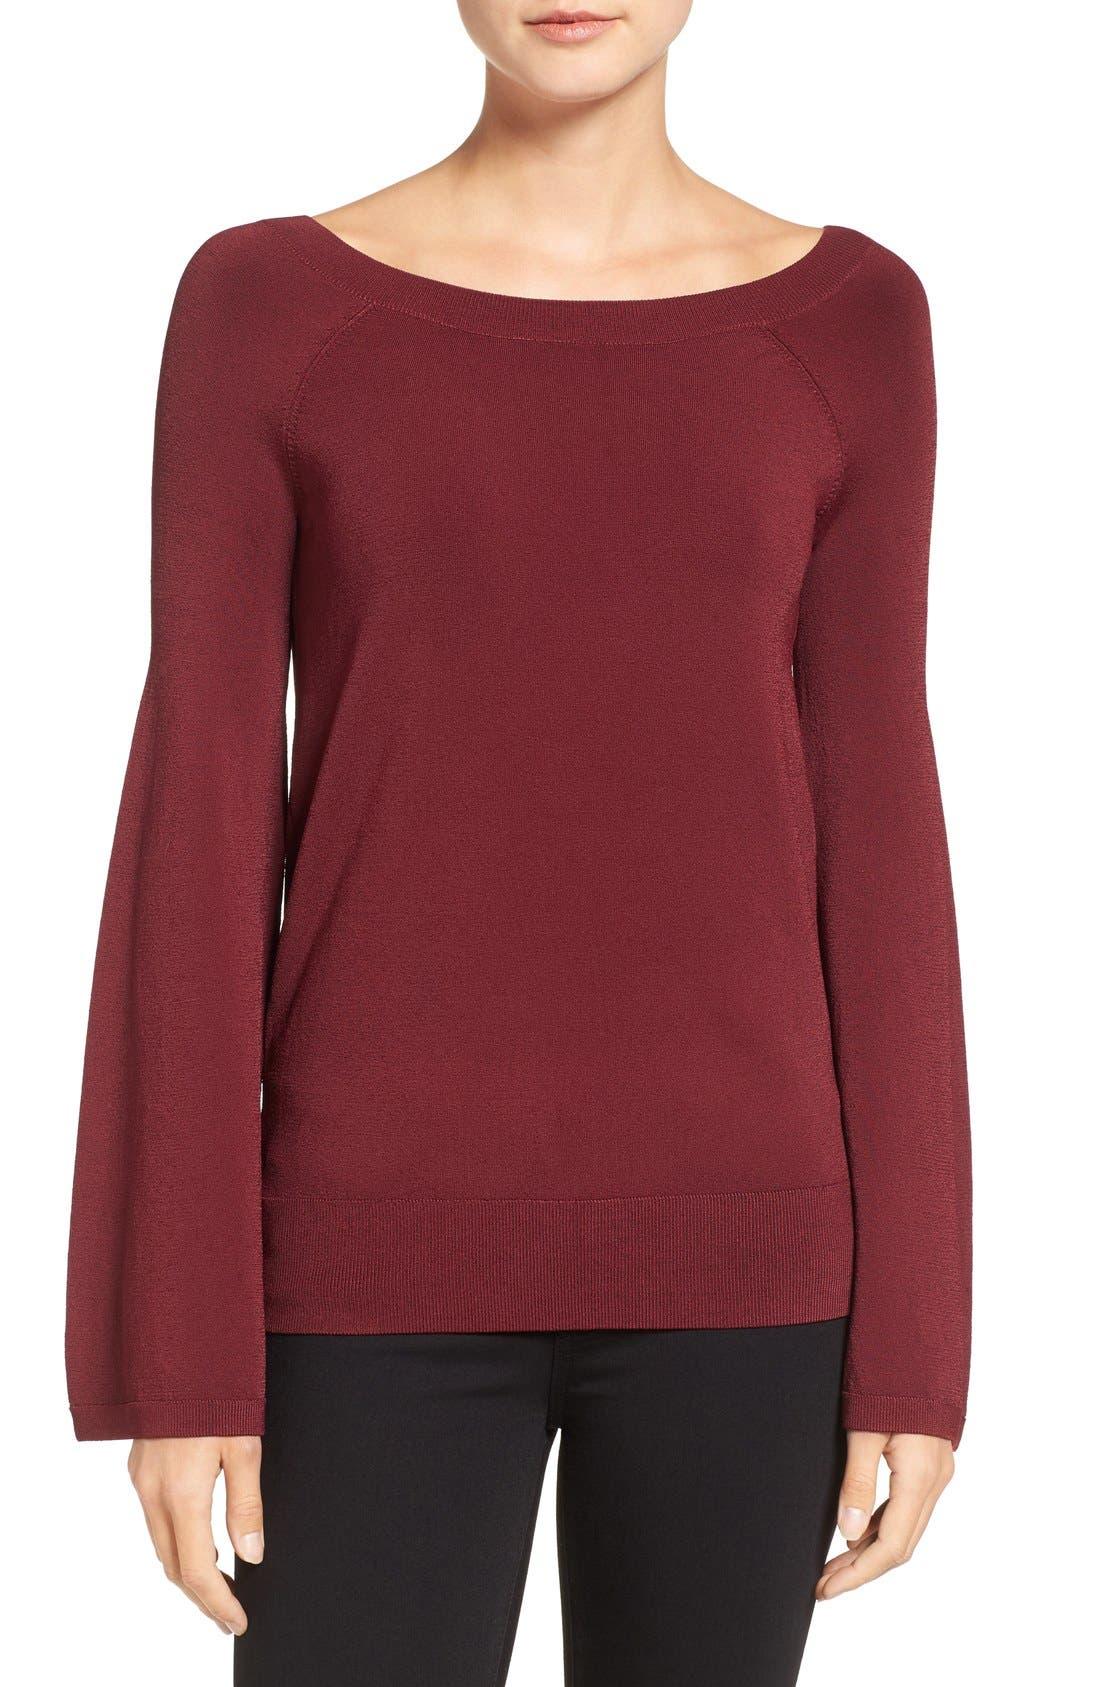 Alternate Image 1 Selected - Chelsea28 Flare Sleeve Sweater